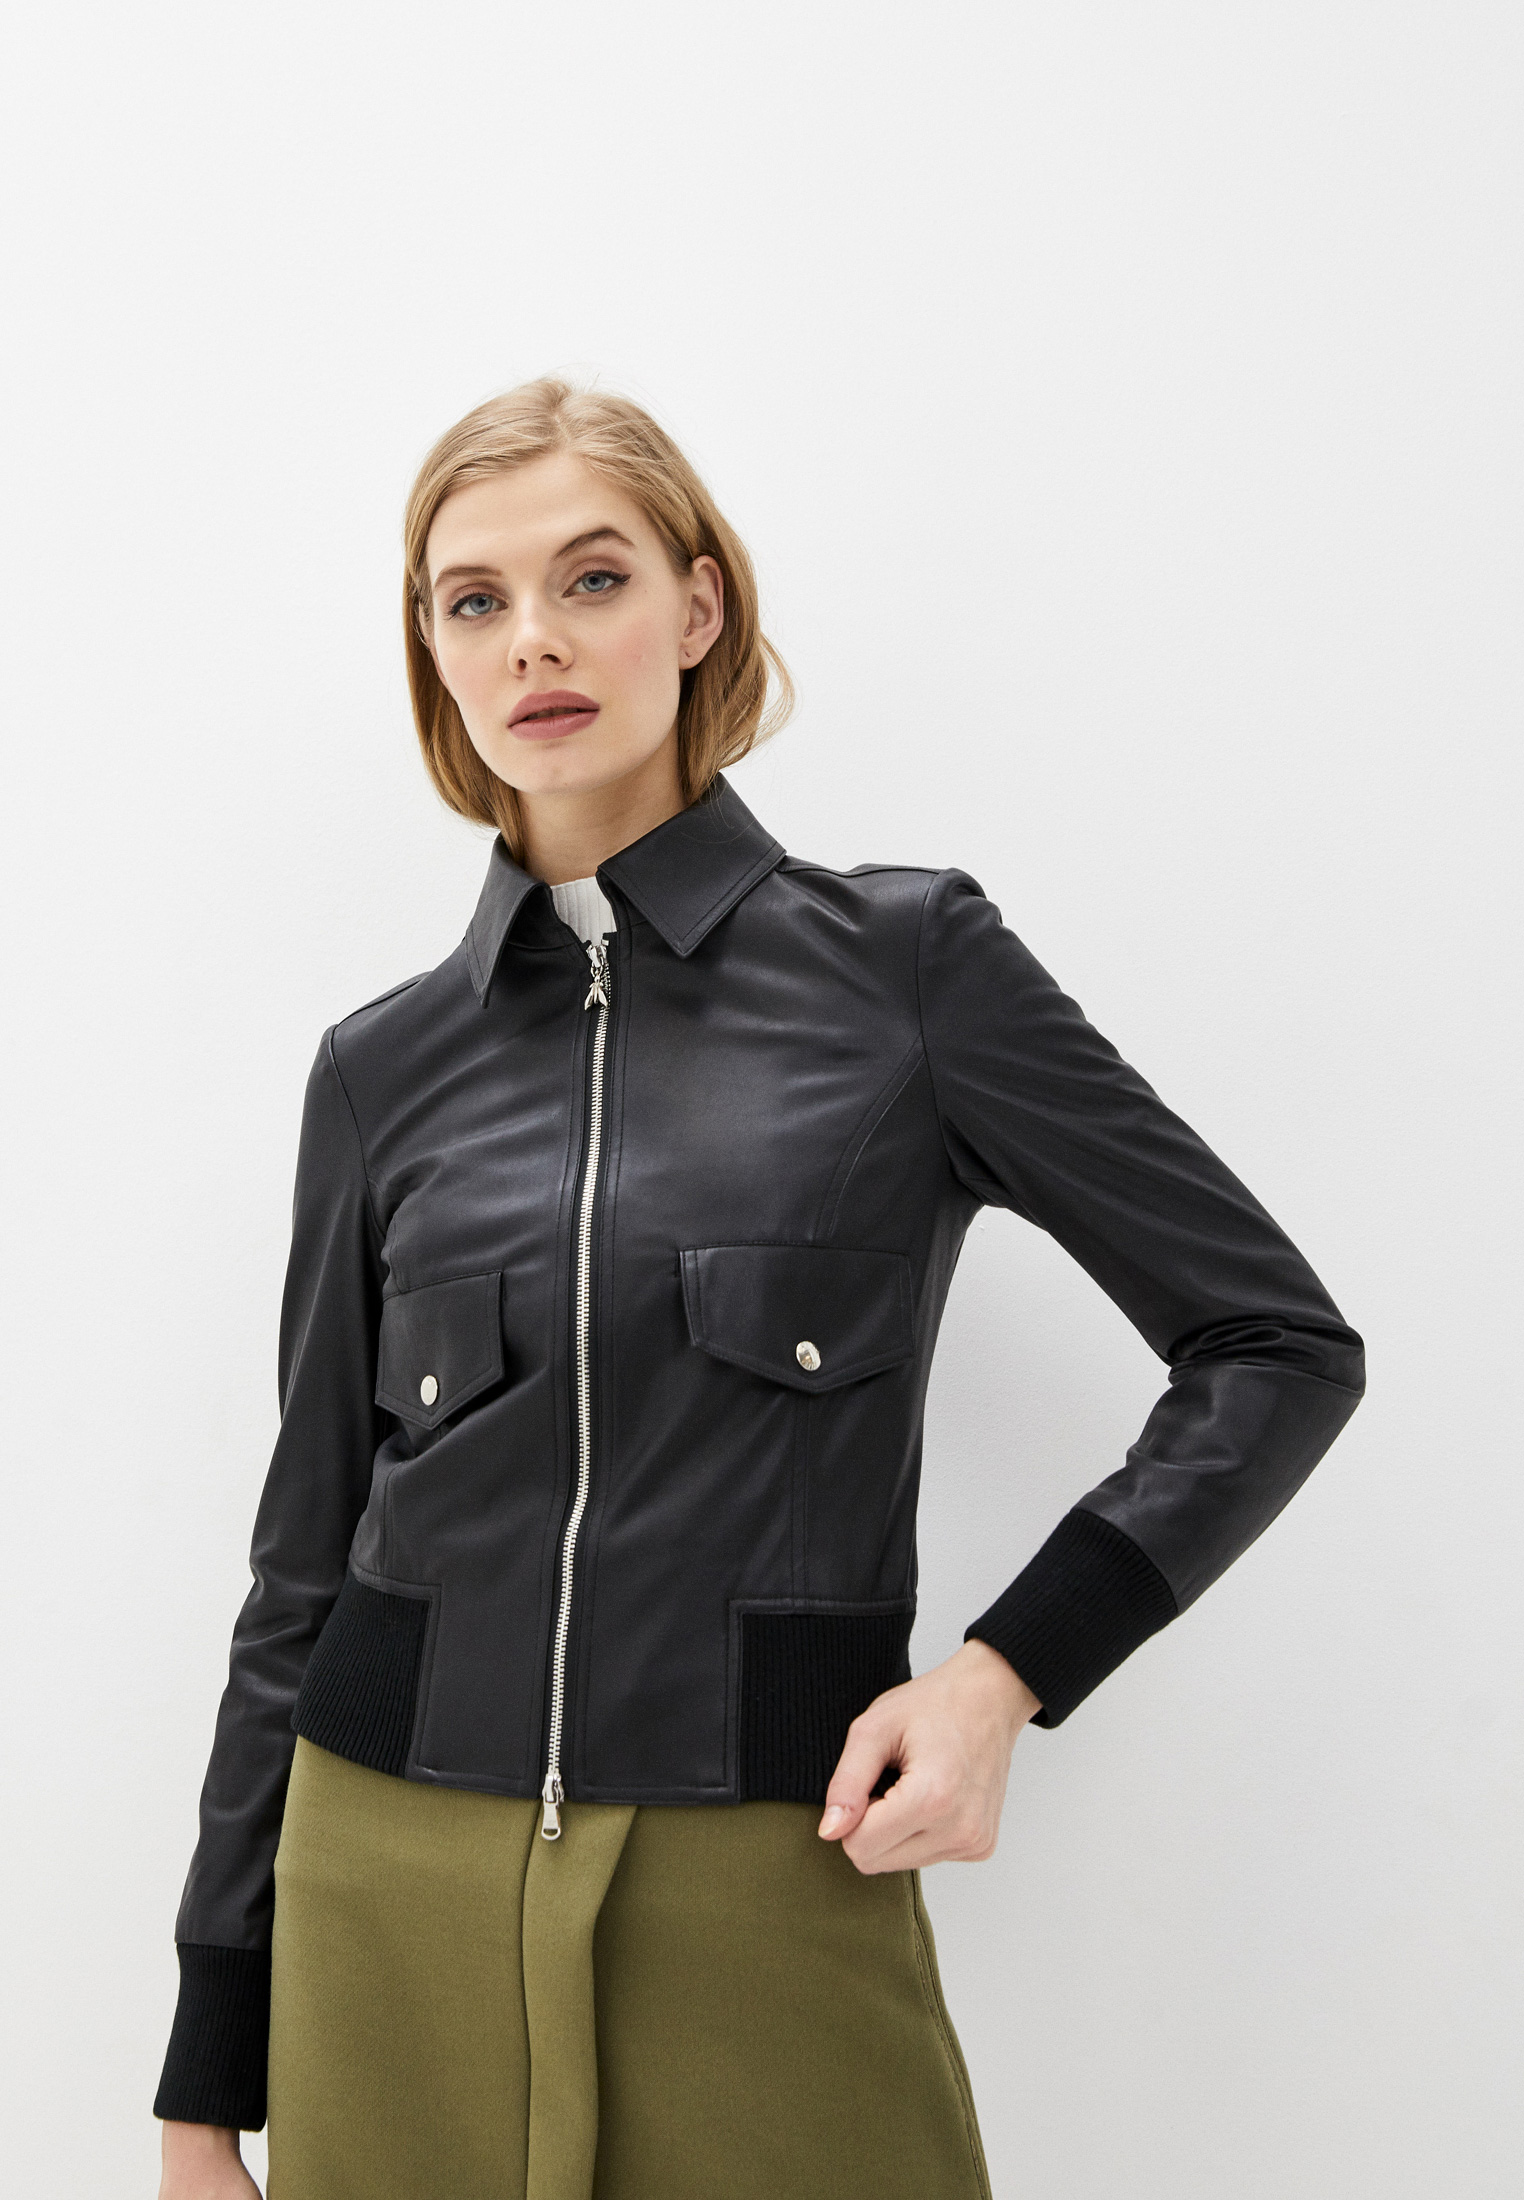 Кожаная куртка Patrizia Pepe (Патриция Пепе) 8L0359